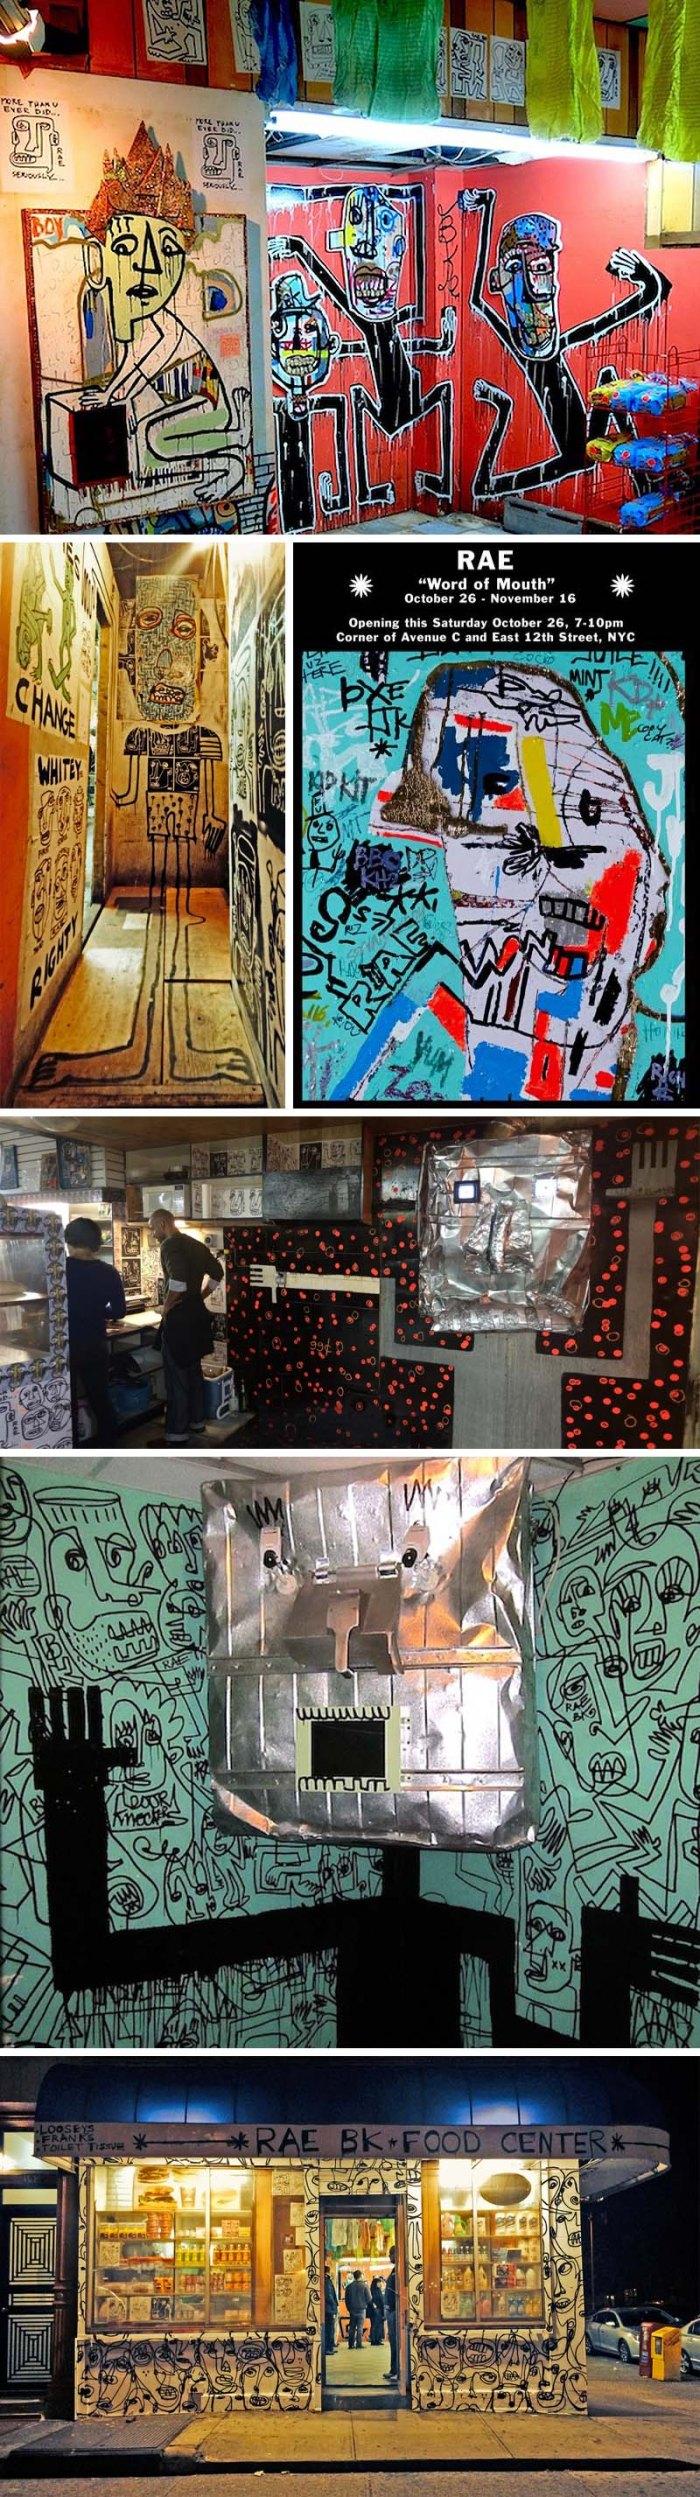 RAE street art, exhibit in East Village Bodega, Word of Mouth, Street Art, Graffiti